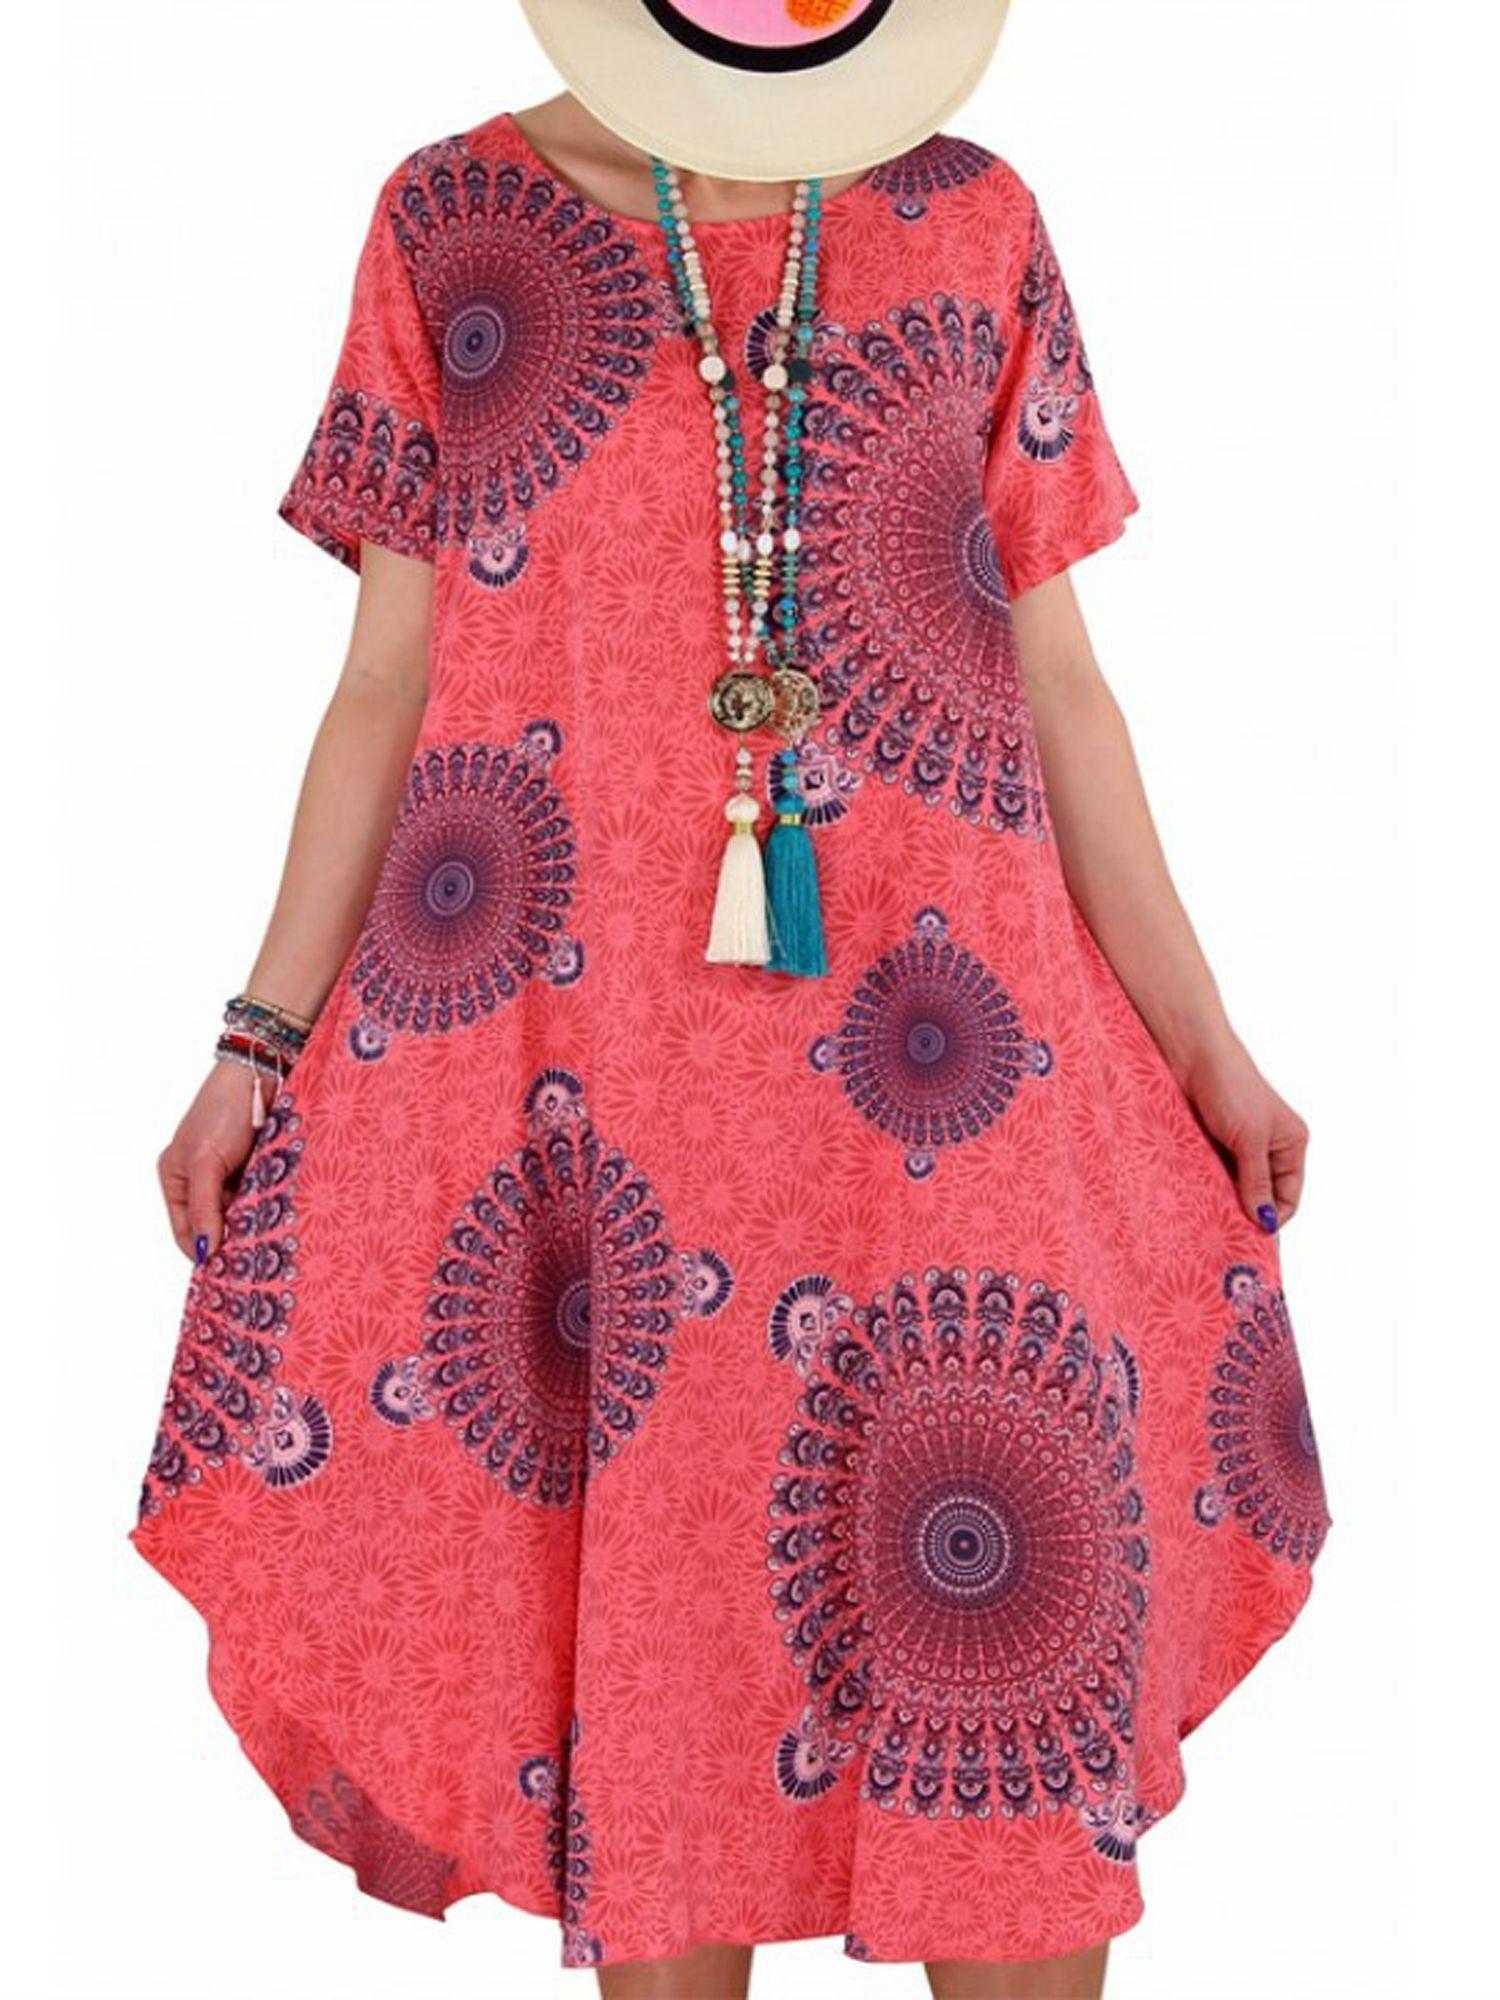 Lallc Plus Size Women Short Sleeve Floral Mini Dress Walmart Com Short Sleeve Dresses Pink Dress Casual Dresses Casual Spring Summer [ 2000 x 1500 Pixel ]